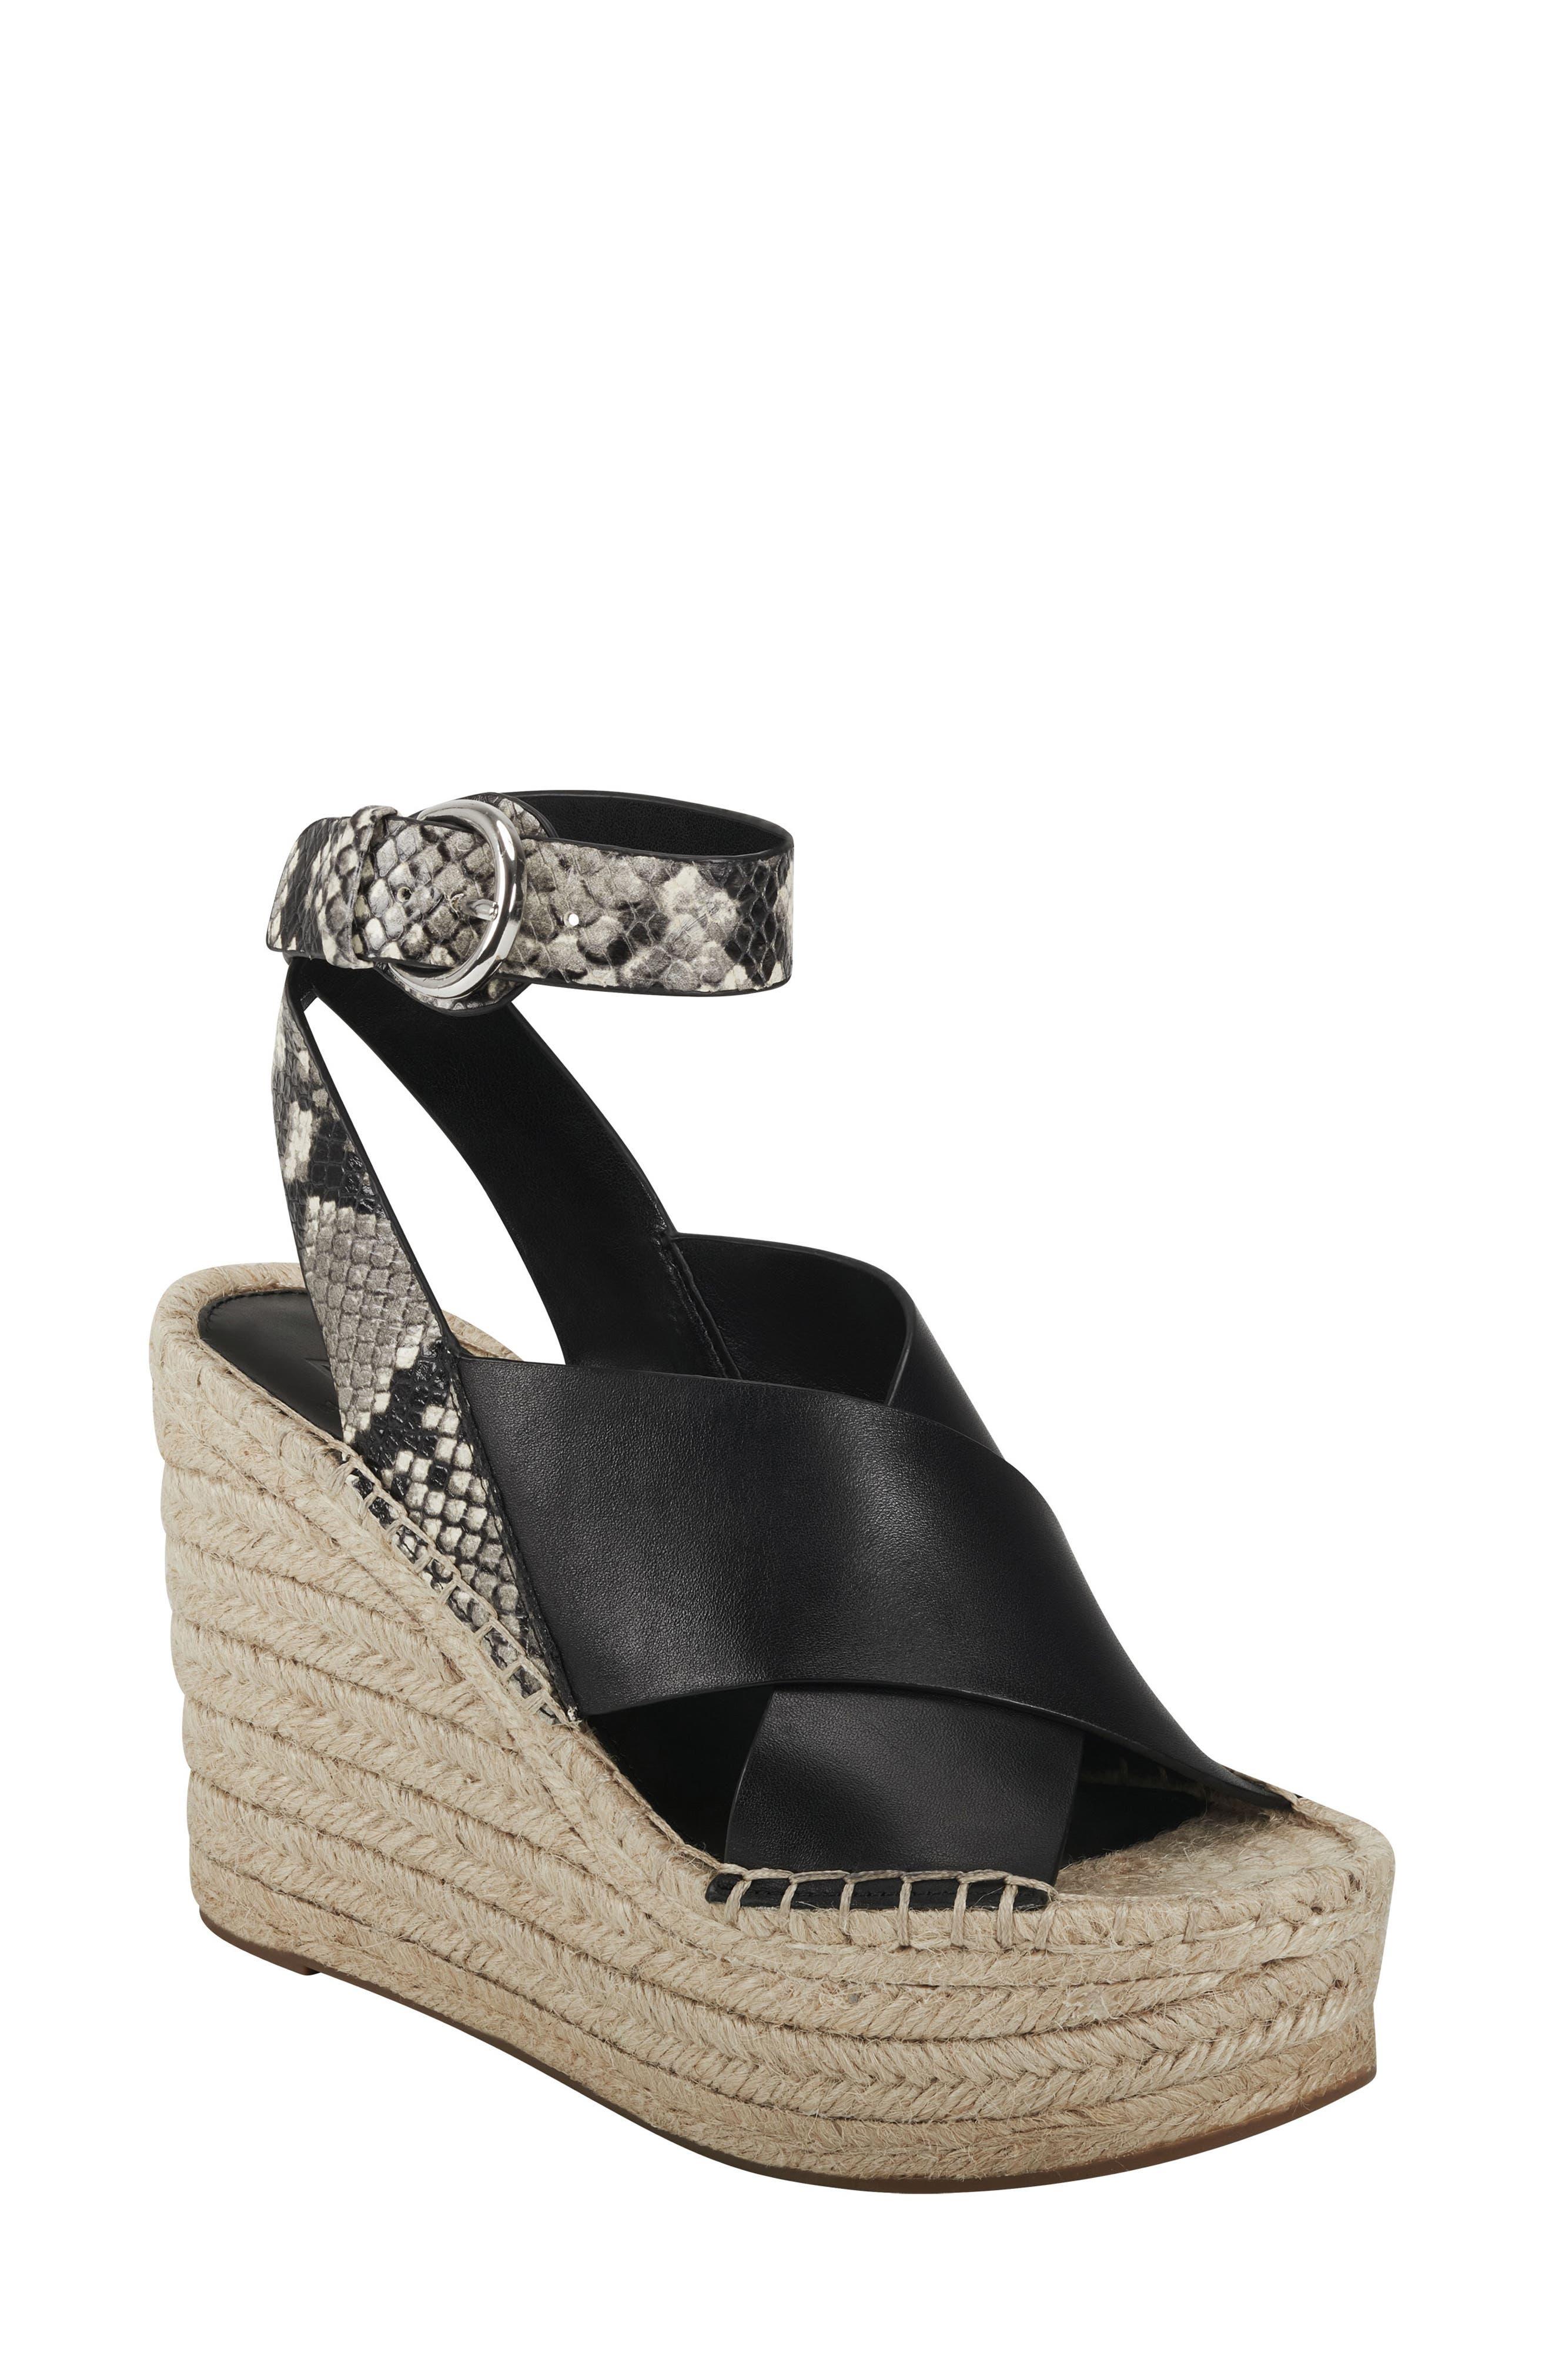 Image of Marc Fisher LTD Abacia Wedge Sandal